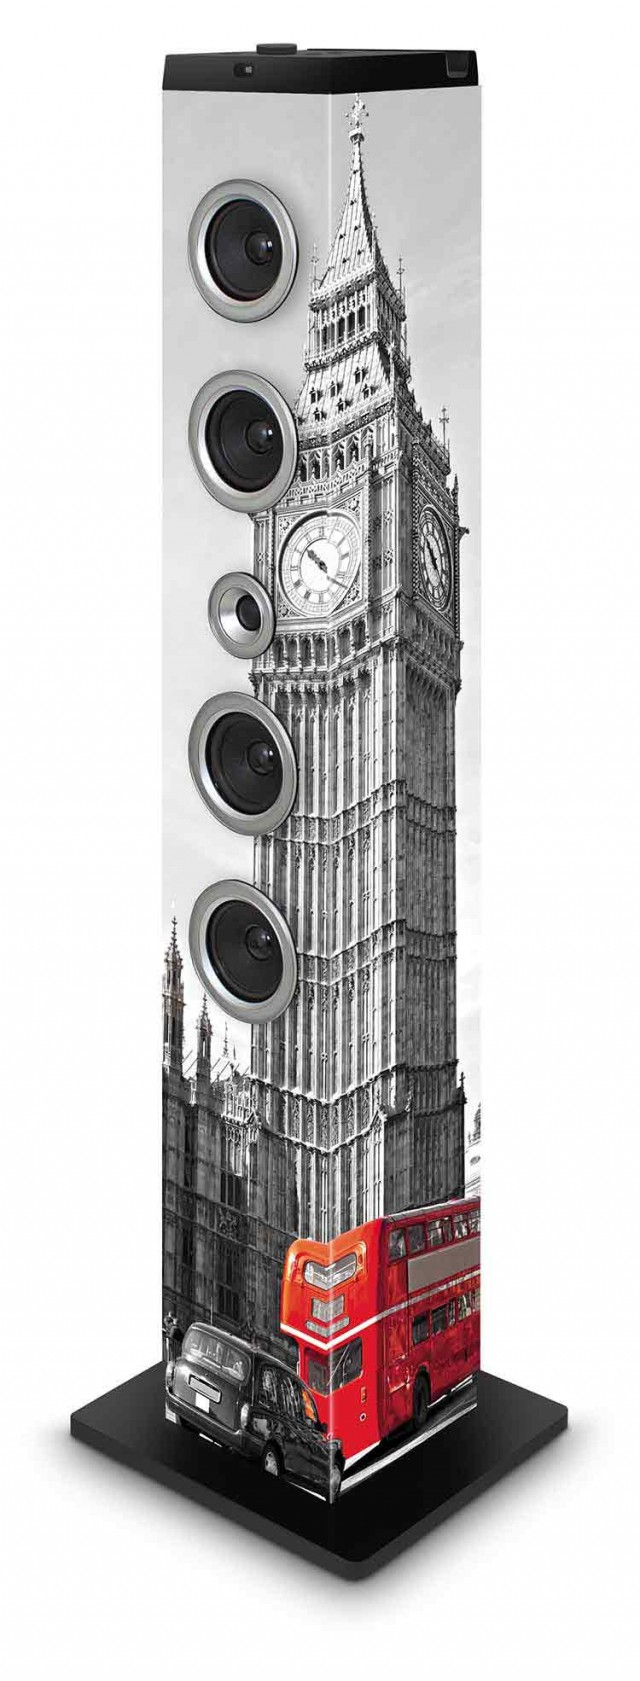 Multimedia Tower London - Packshot